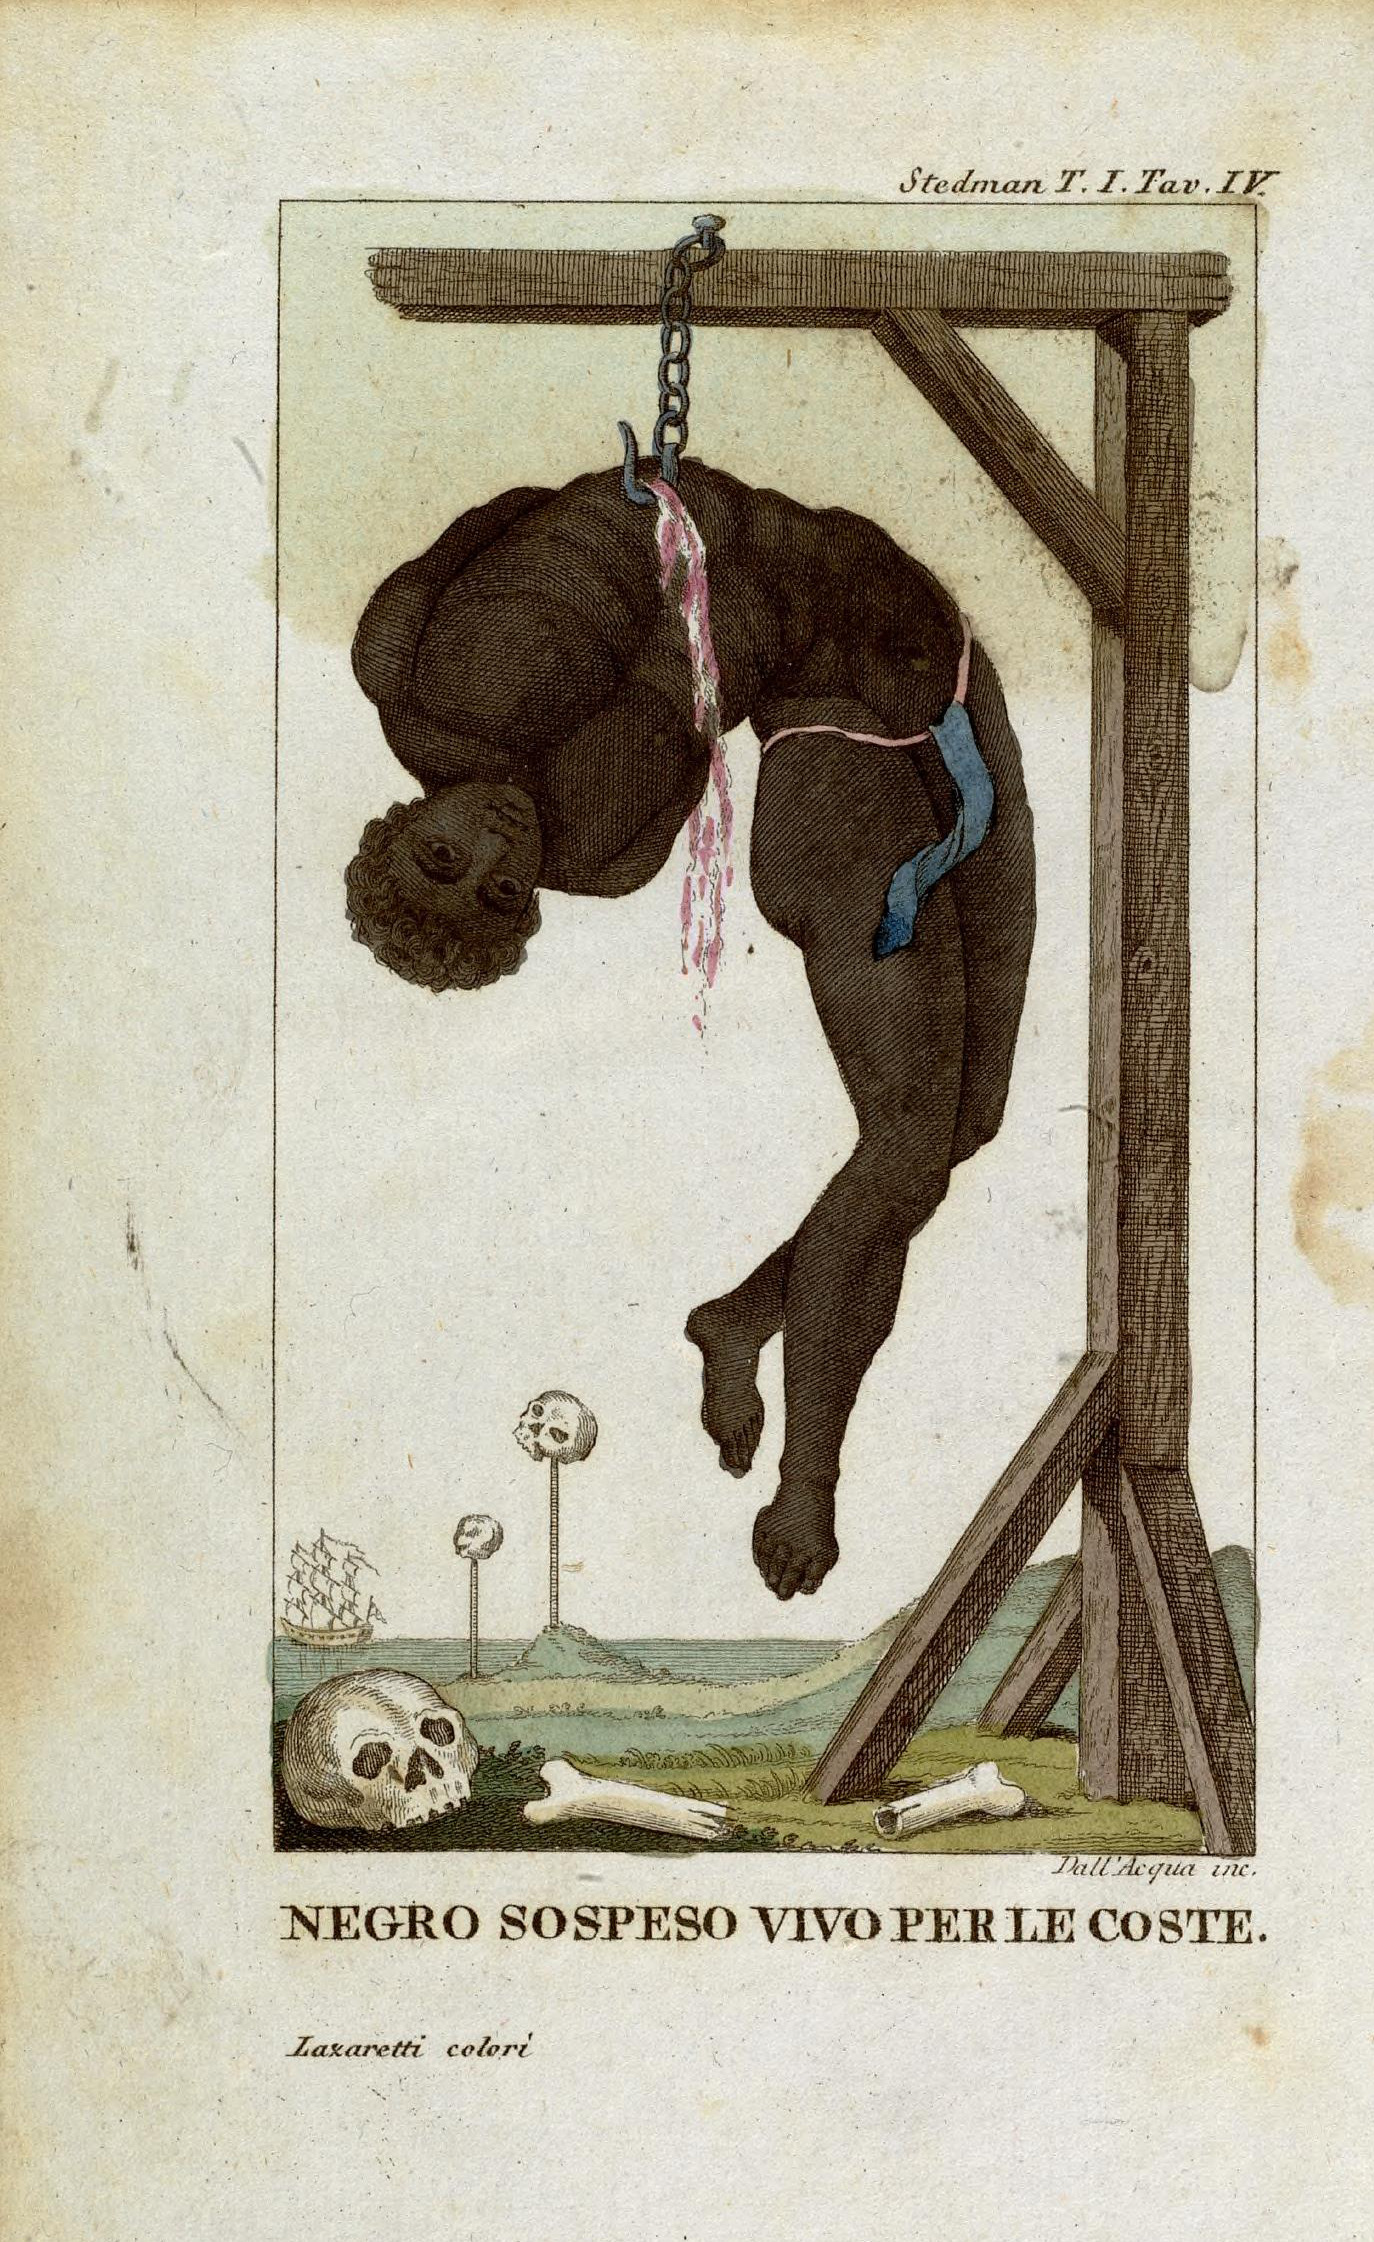 http://upload.wikimedia.org/wikipedia/commons/1/10/Stedman-hanging.jpg